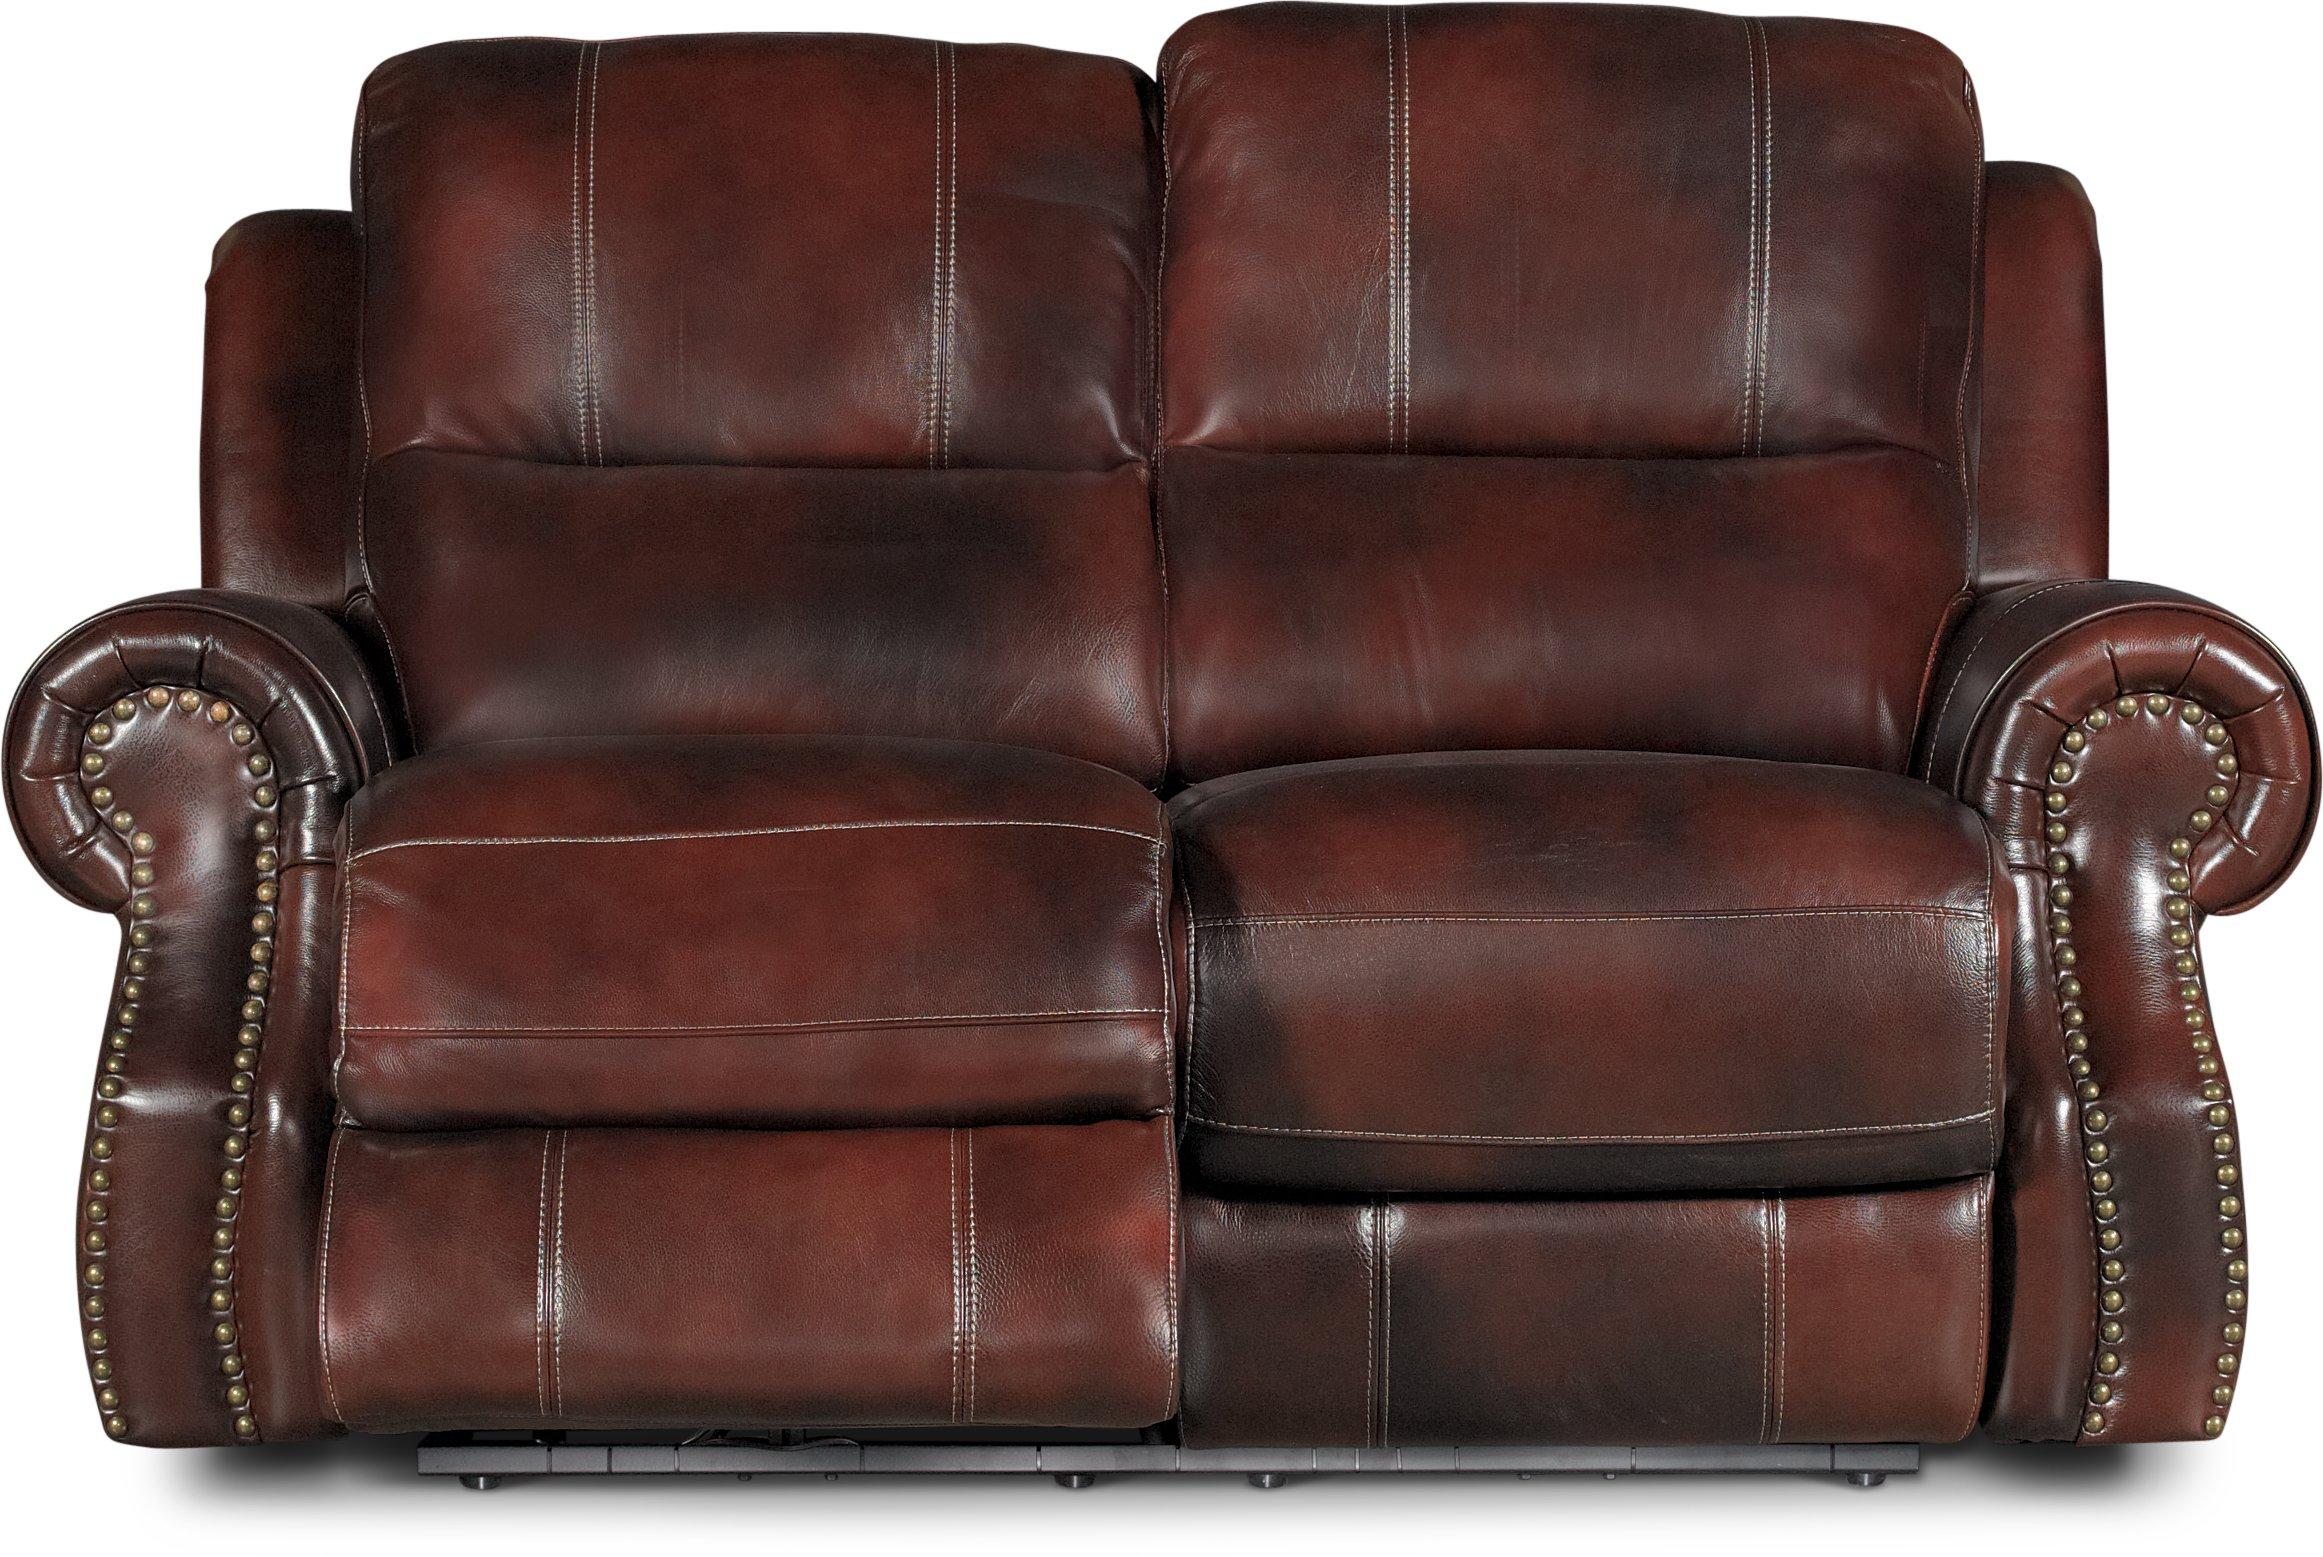 Auburn Leather Match Power Reclining Sofa Amp Loveseat